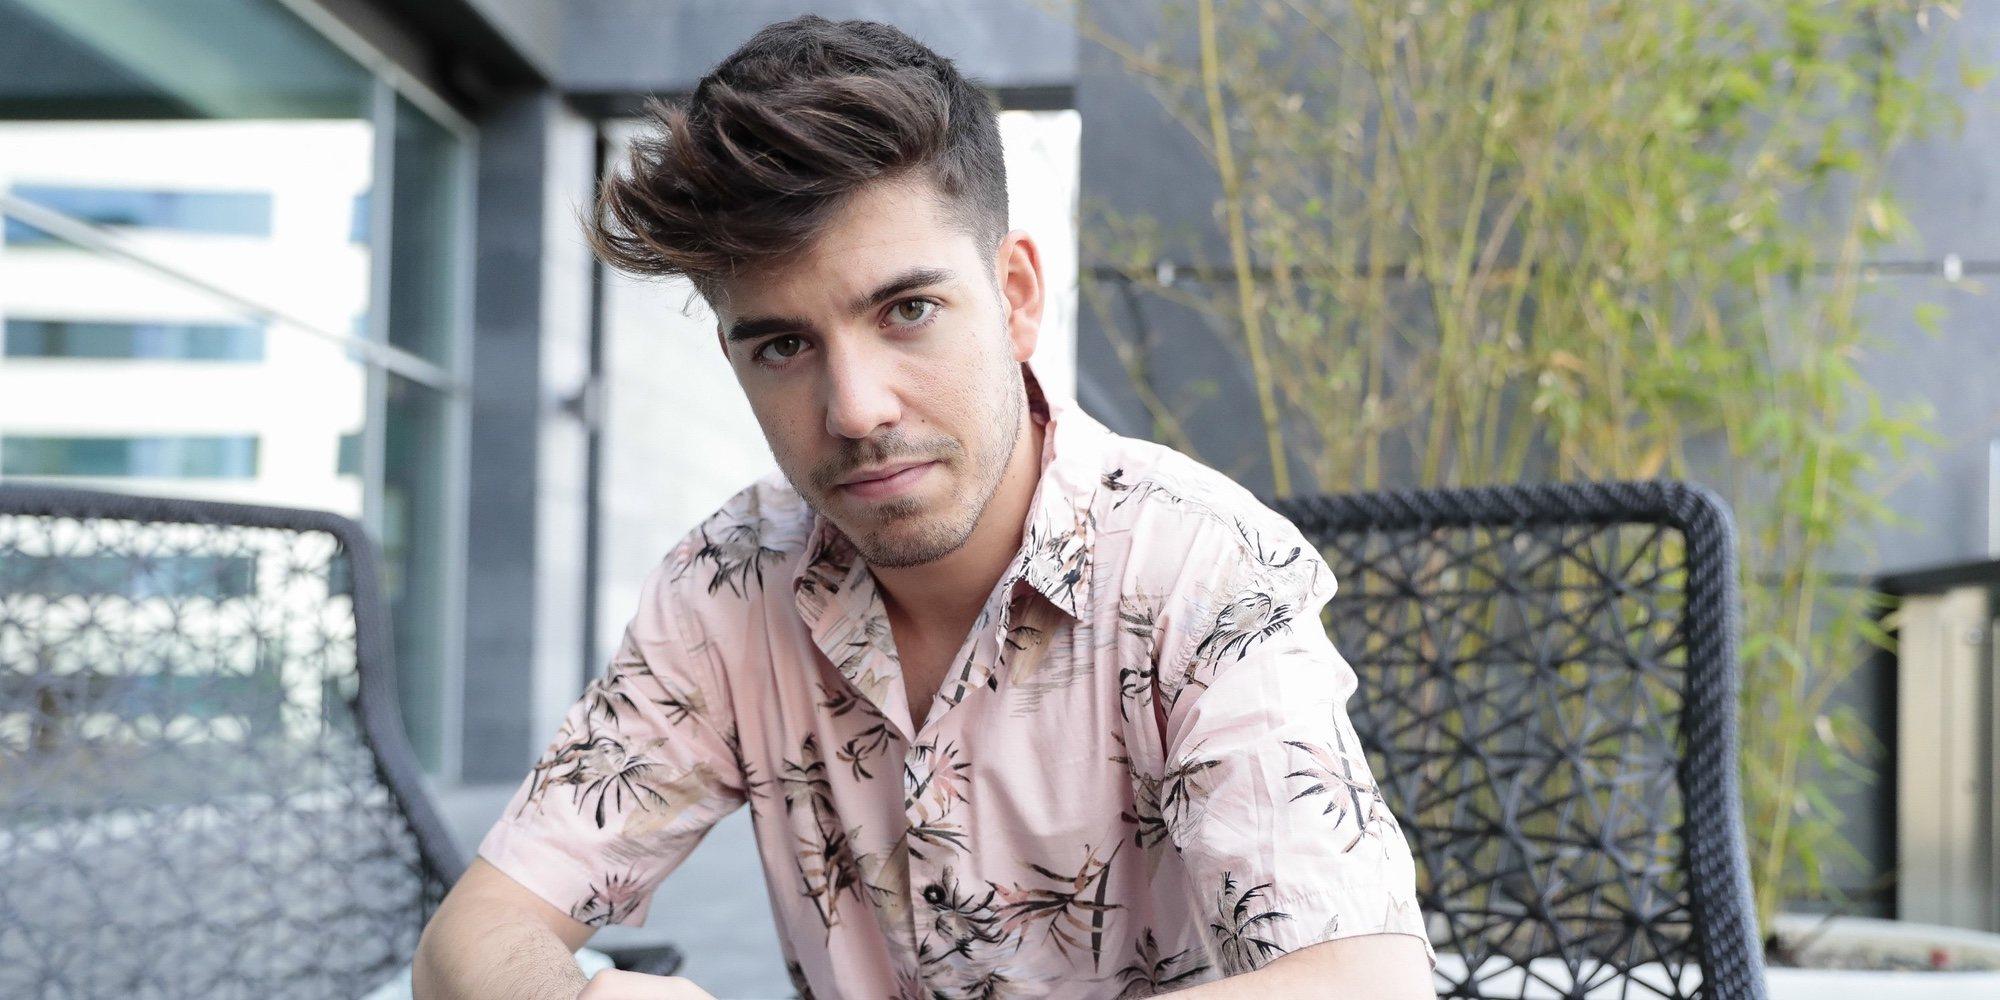 entrevista roi mendez ot 2017 por una vez mas sapoconcho single gira